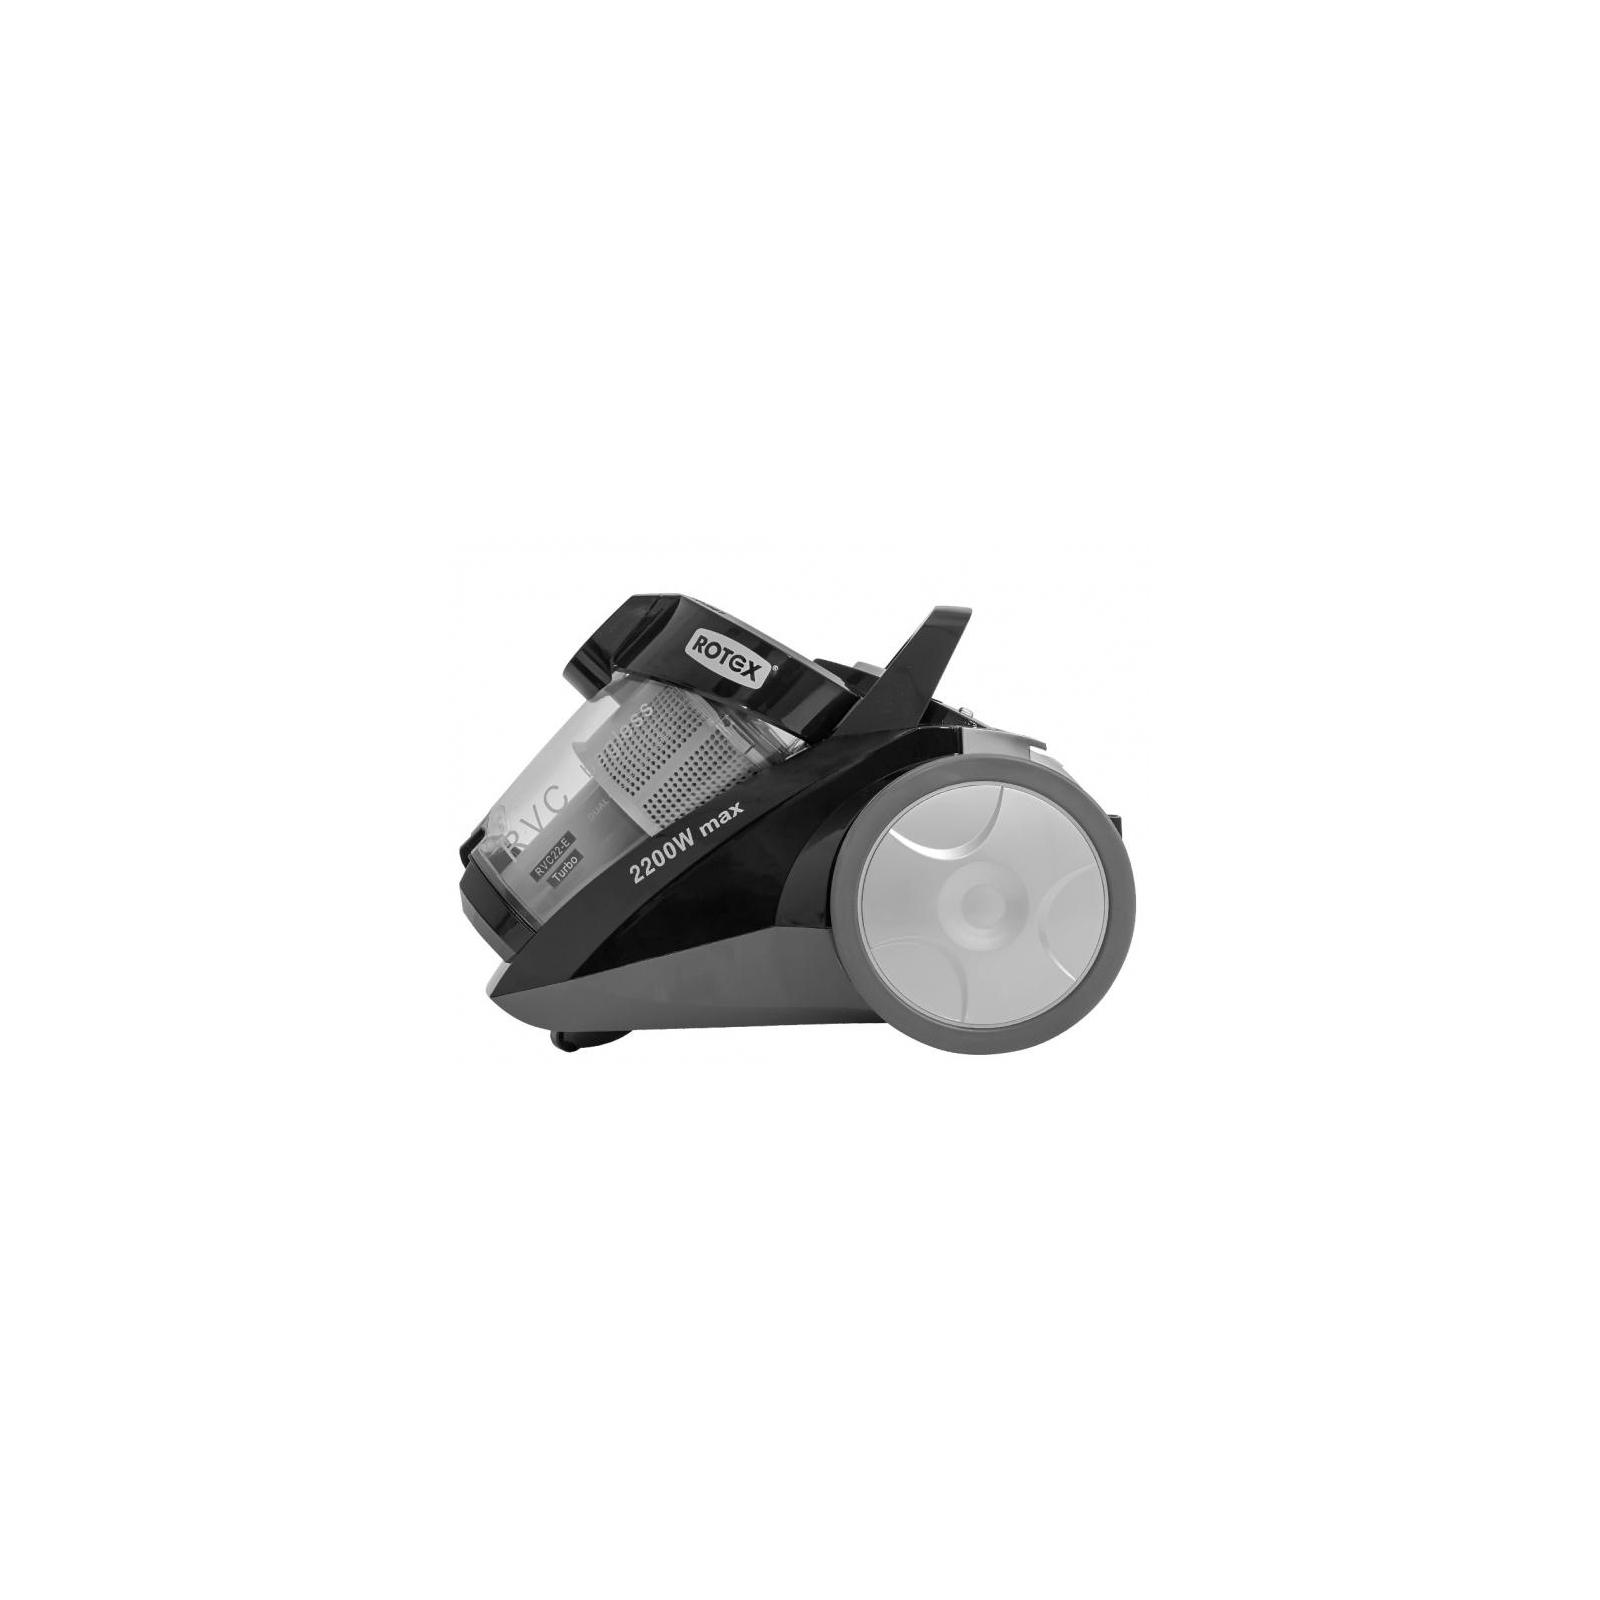 Пылесос Rotex RVC22-E Turbo изображение 2